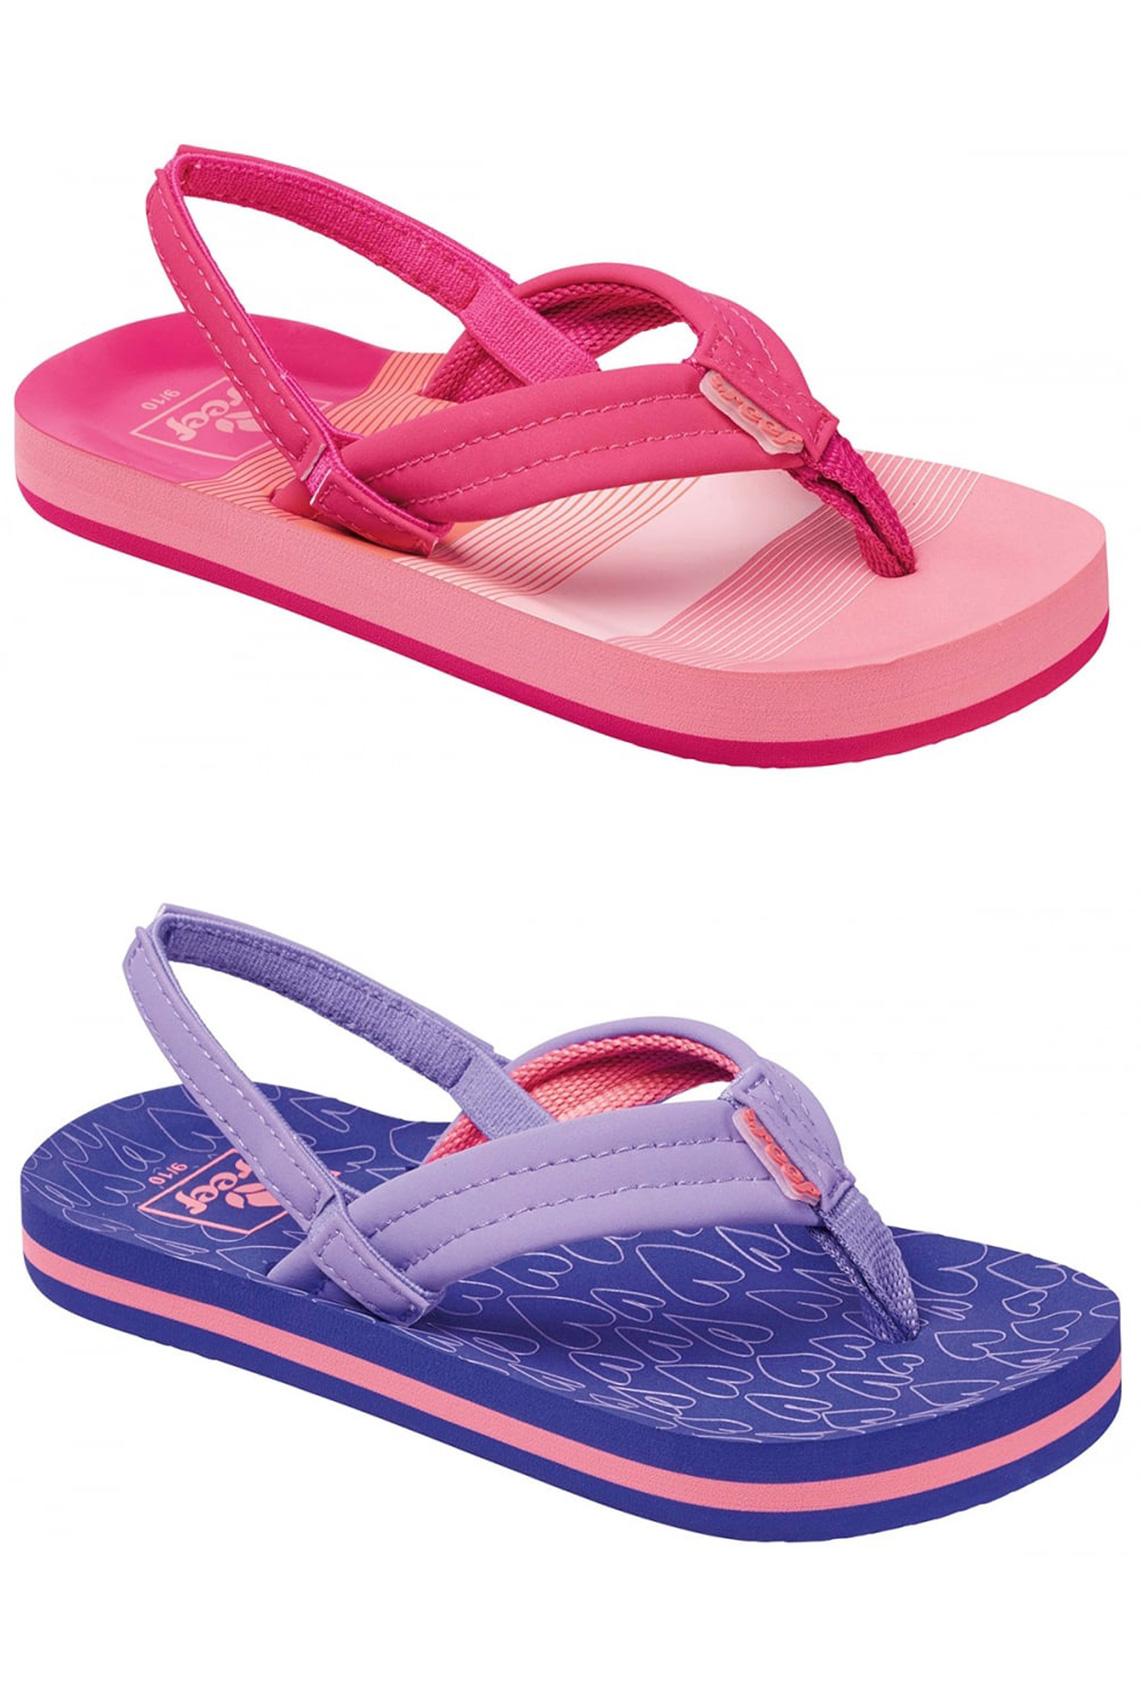 407f62cb0911 Sentinel Reef Kids Sandals - Little Ahi - Purple Hearts